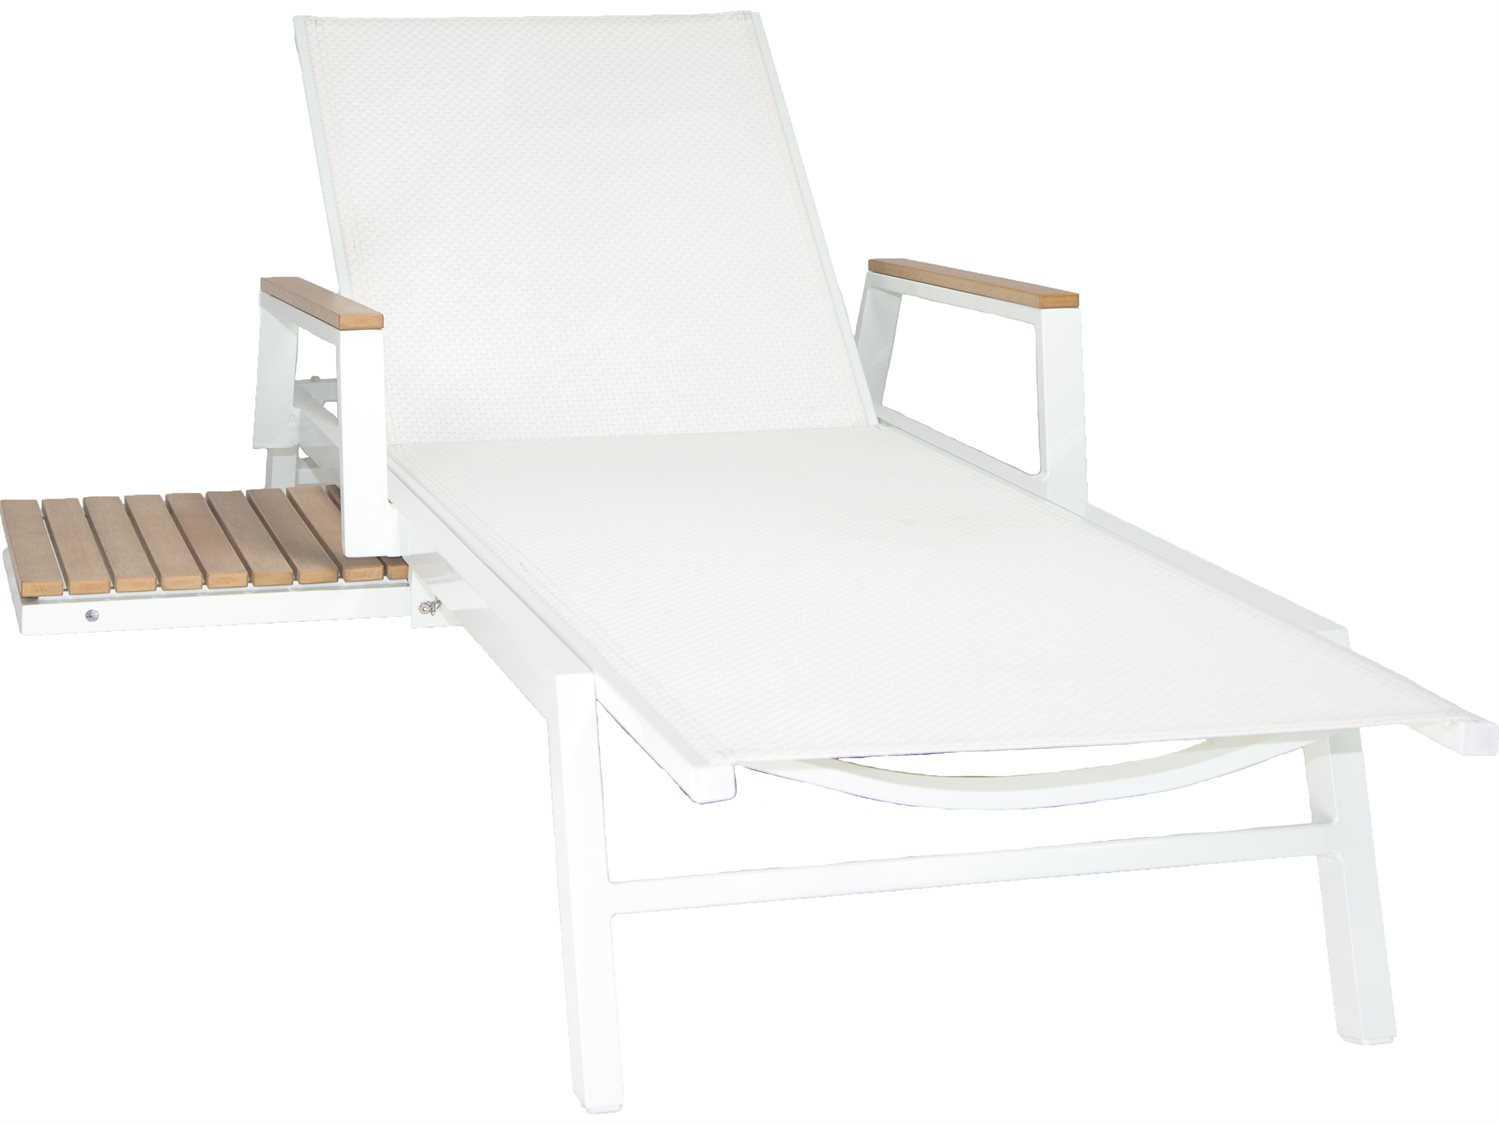 Patio heaven riviera aluminum chaise lounger jrx2291 1b for Patio heaven